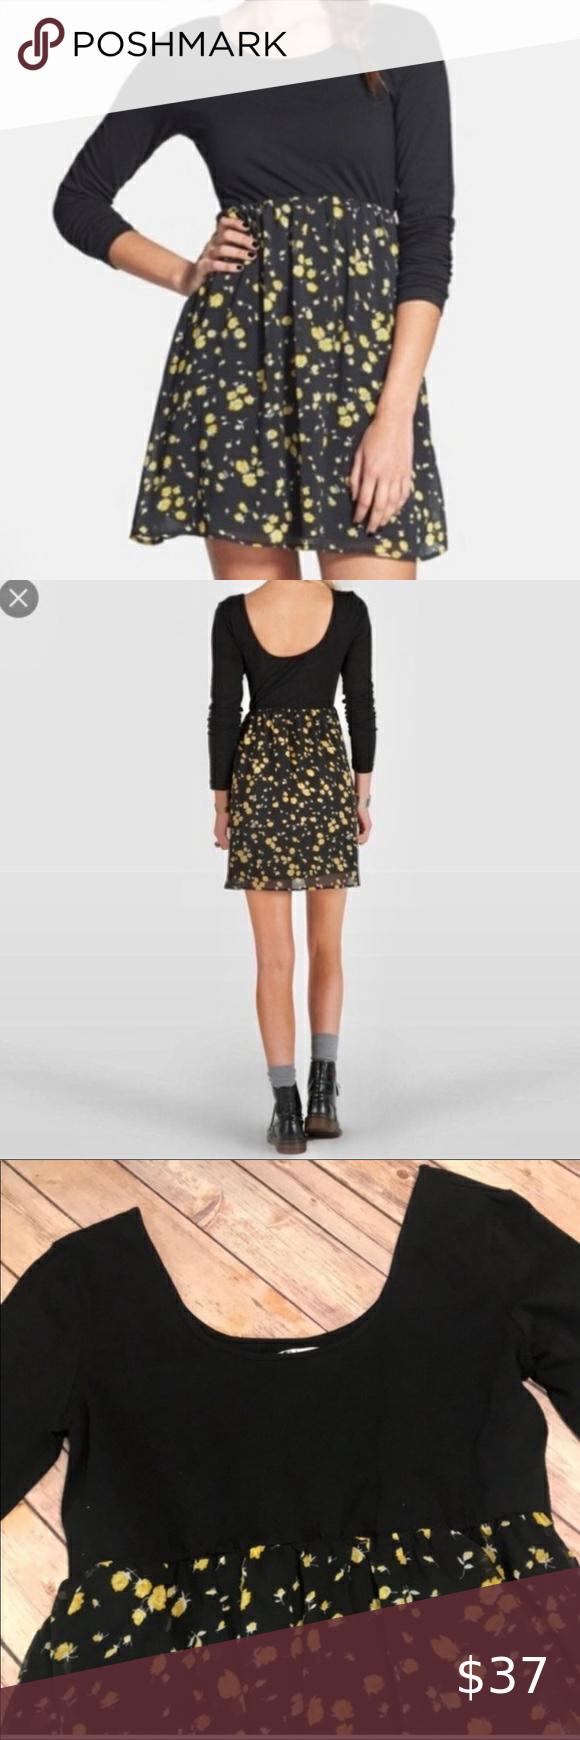 Nwt Volcom Black Dress With Yellow Flowers Cute White Dress Denim Mini Dress Floral Dress Black [ 1740 x 580 Pixel ]